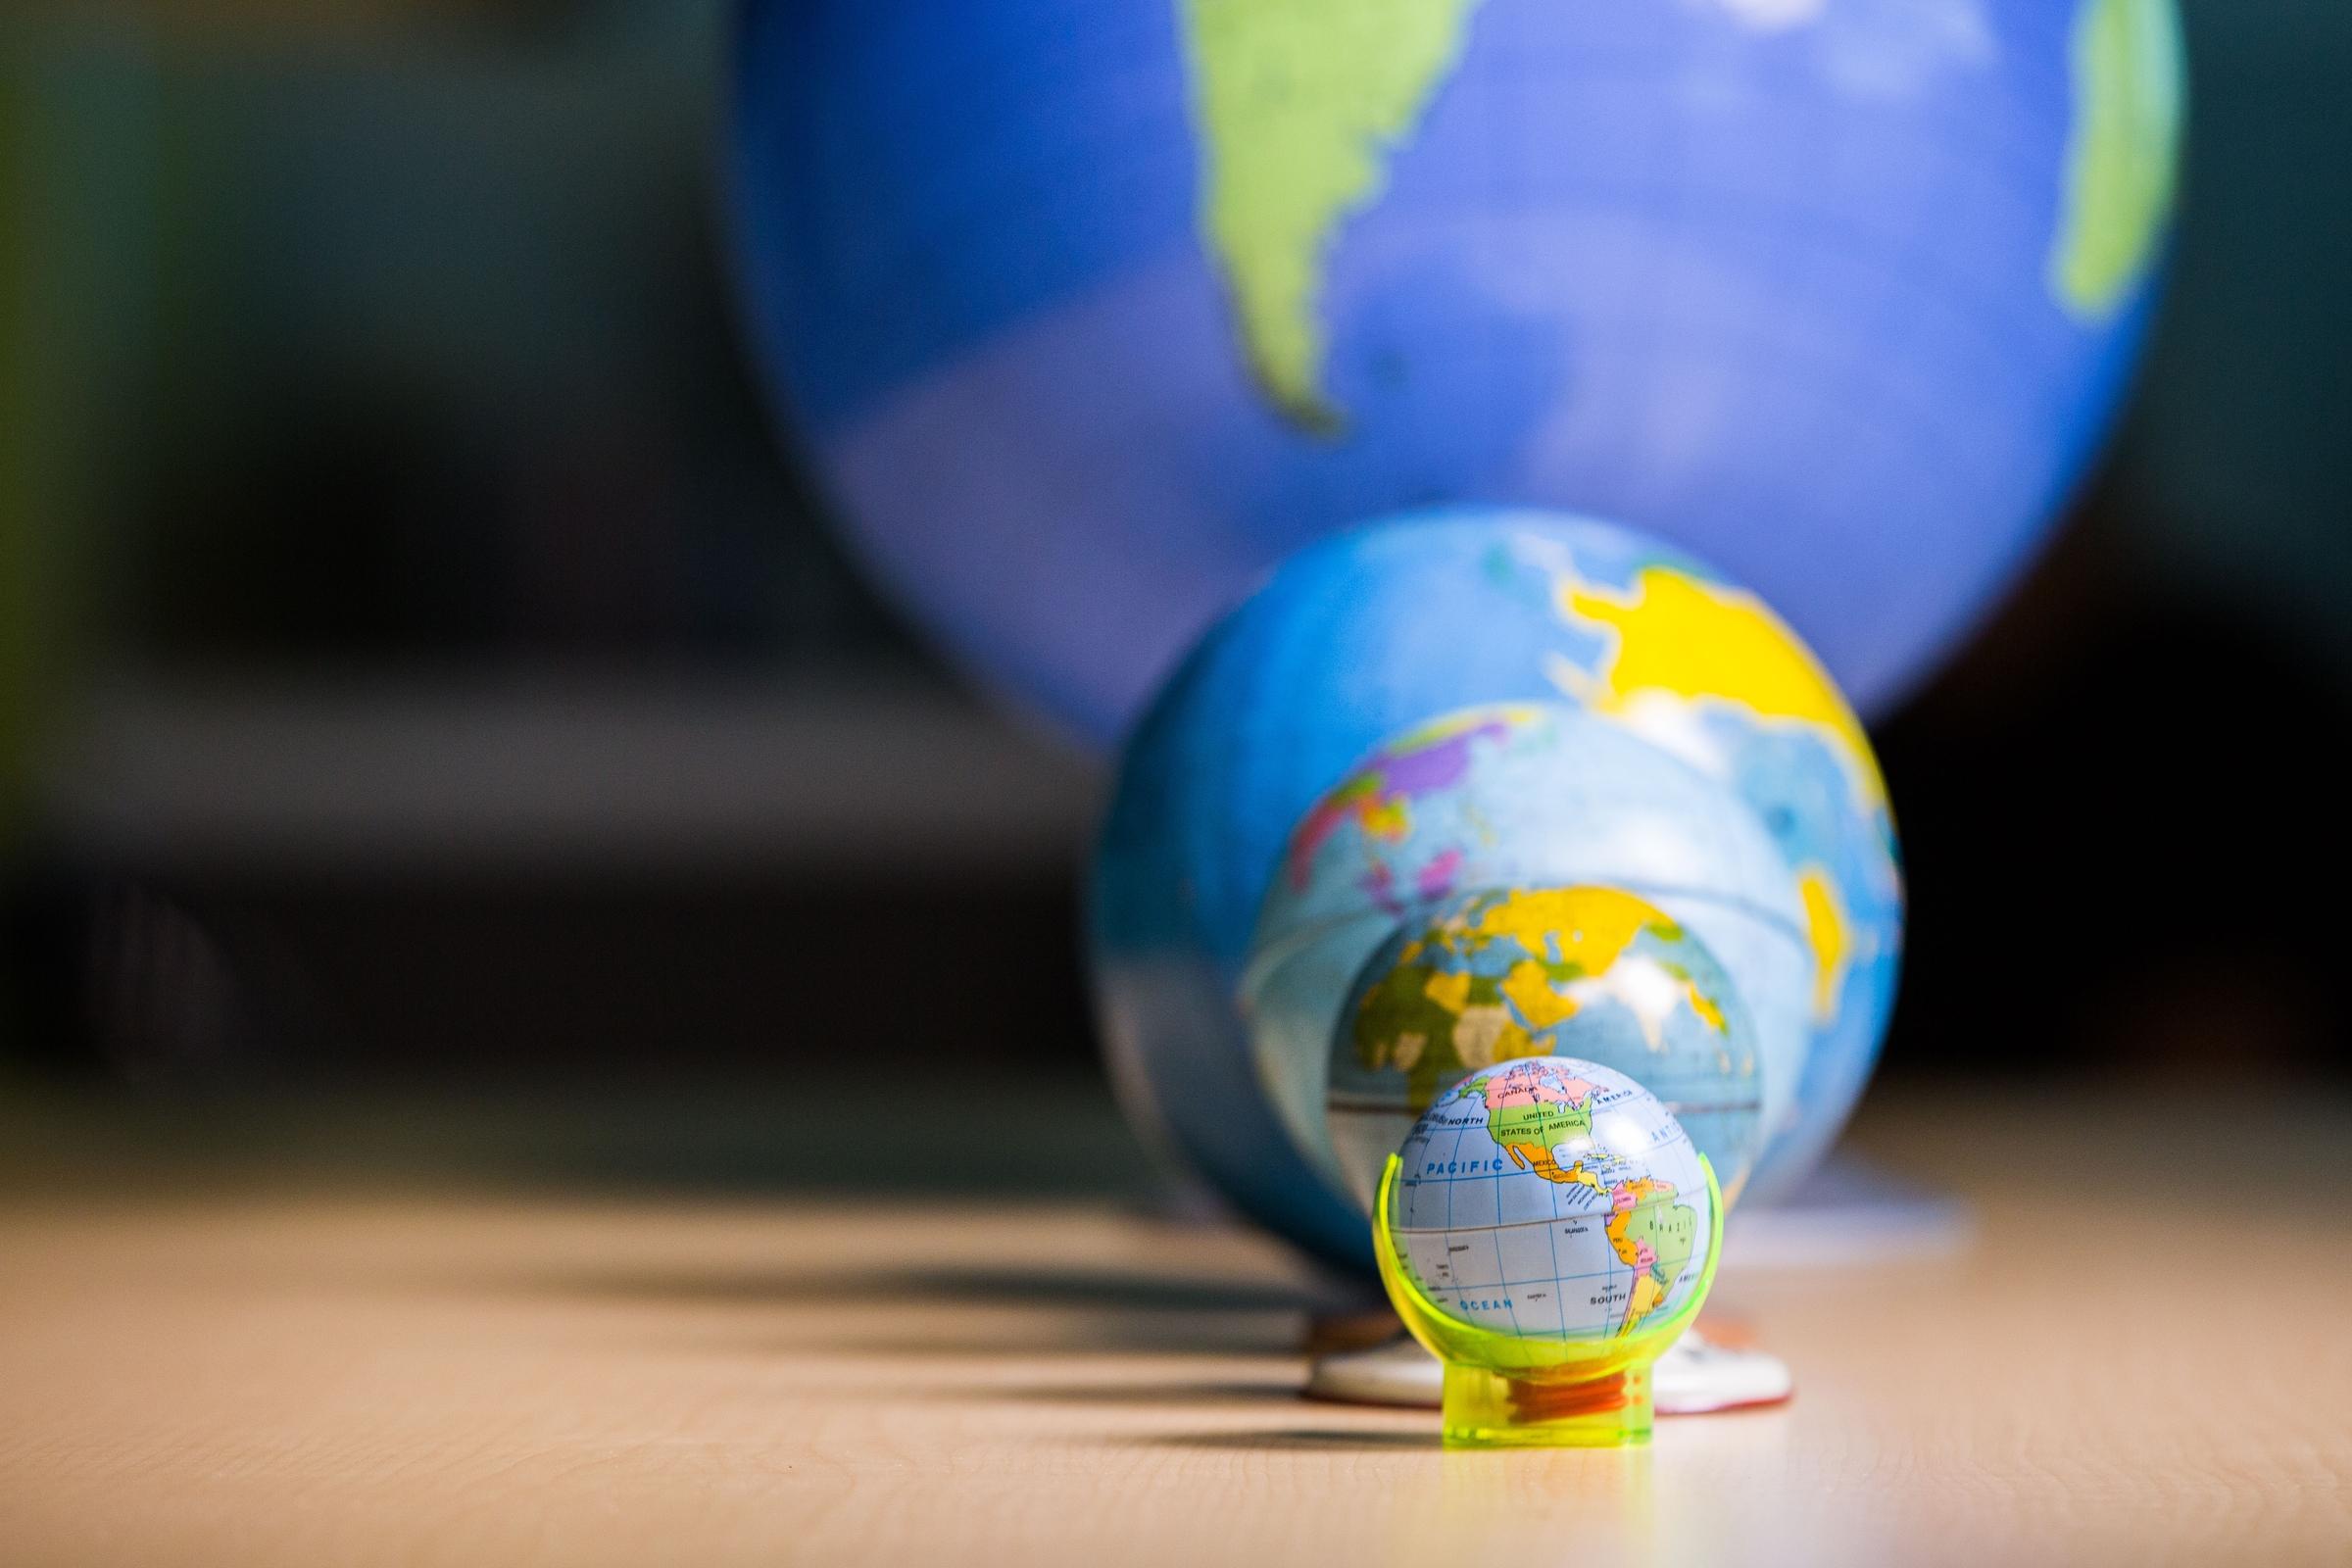 Big globe, small globes